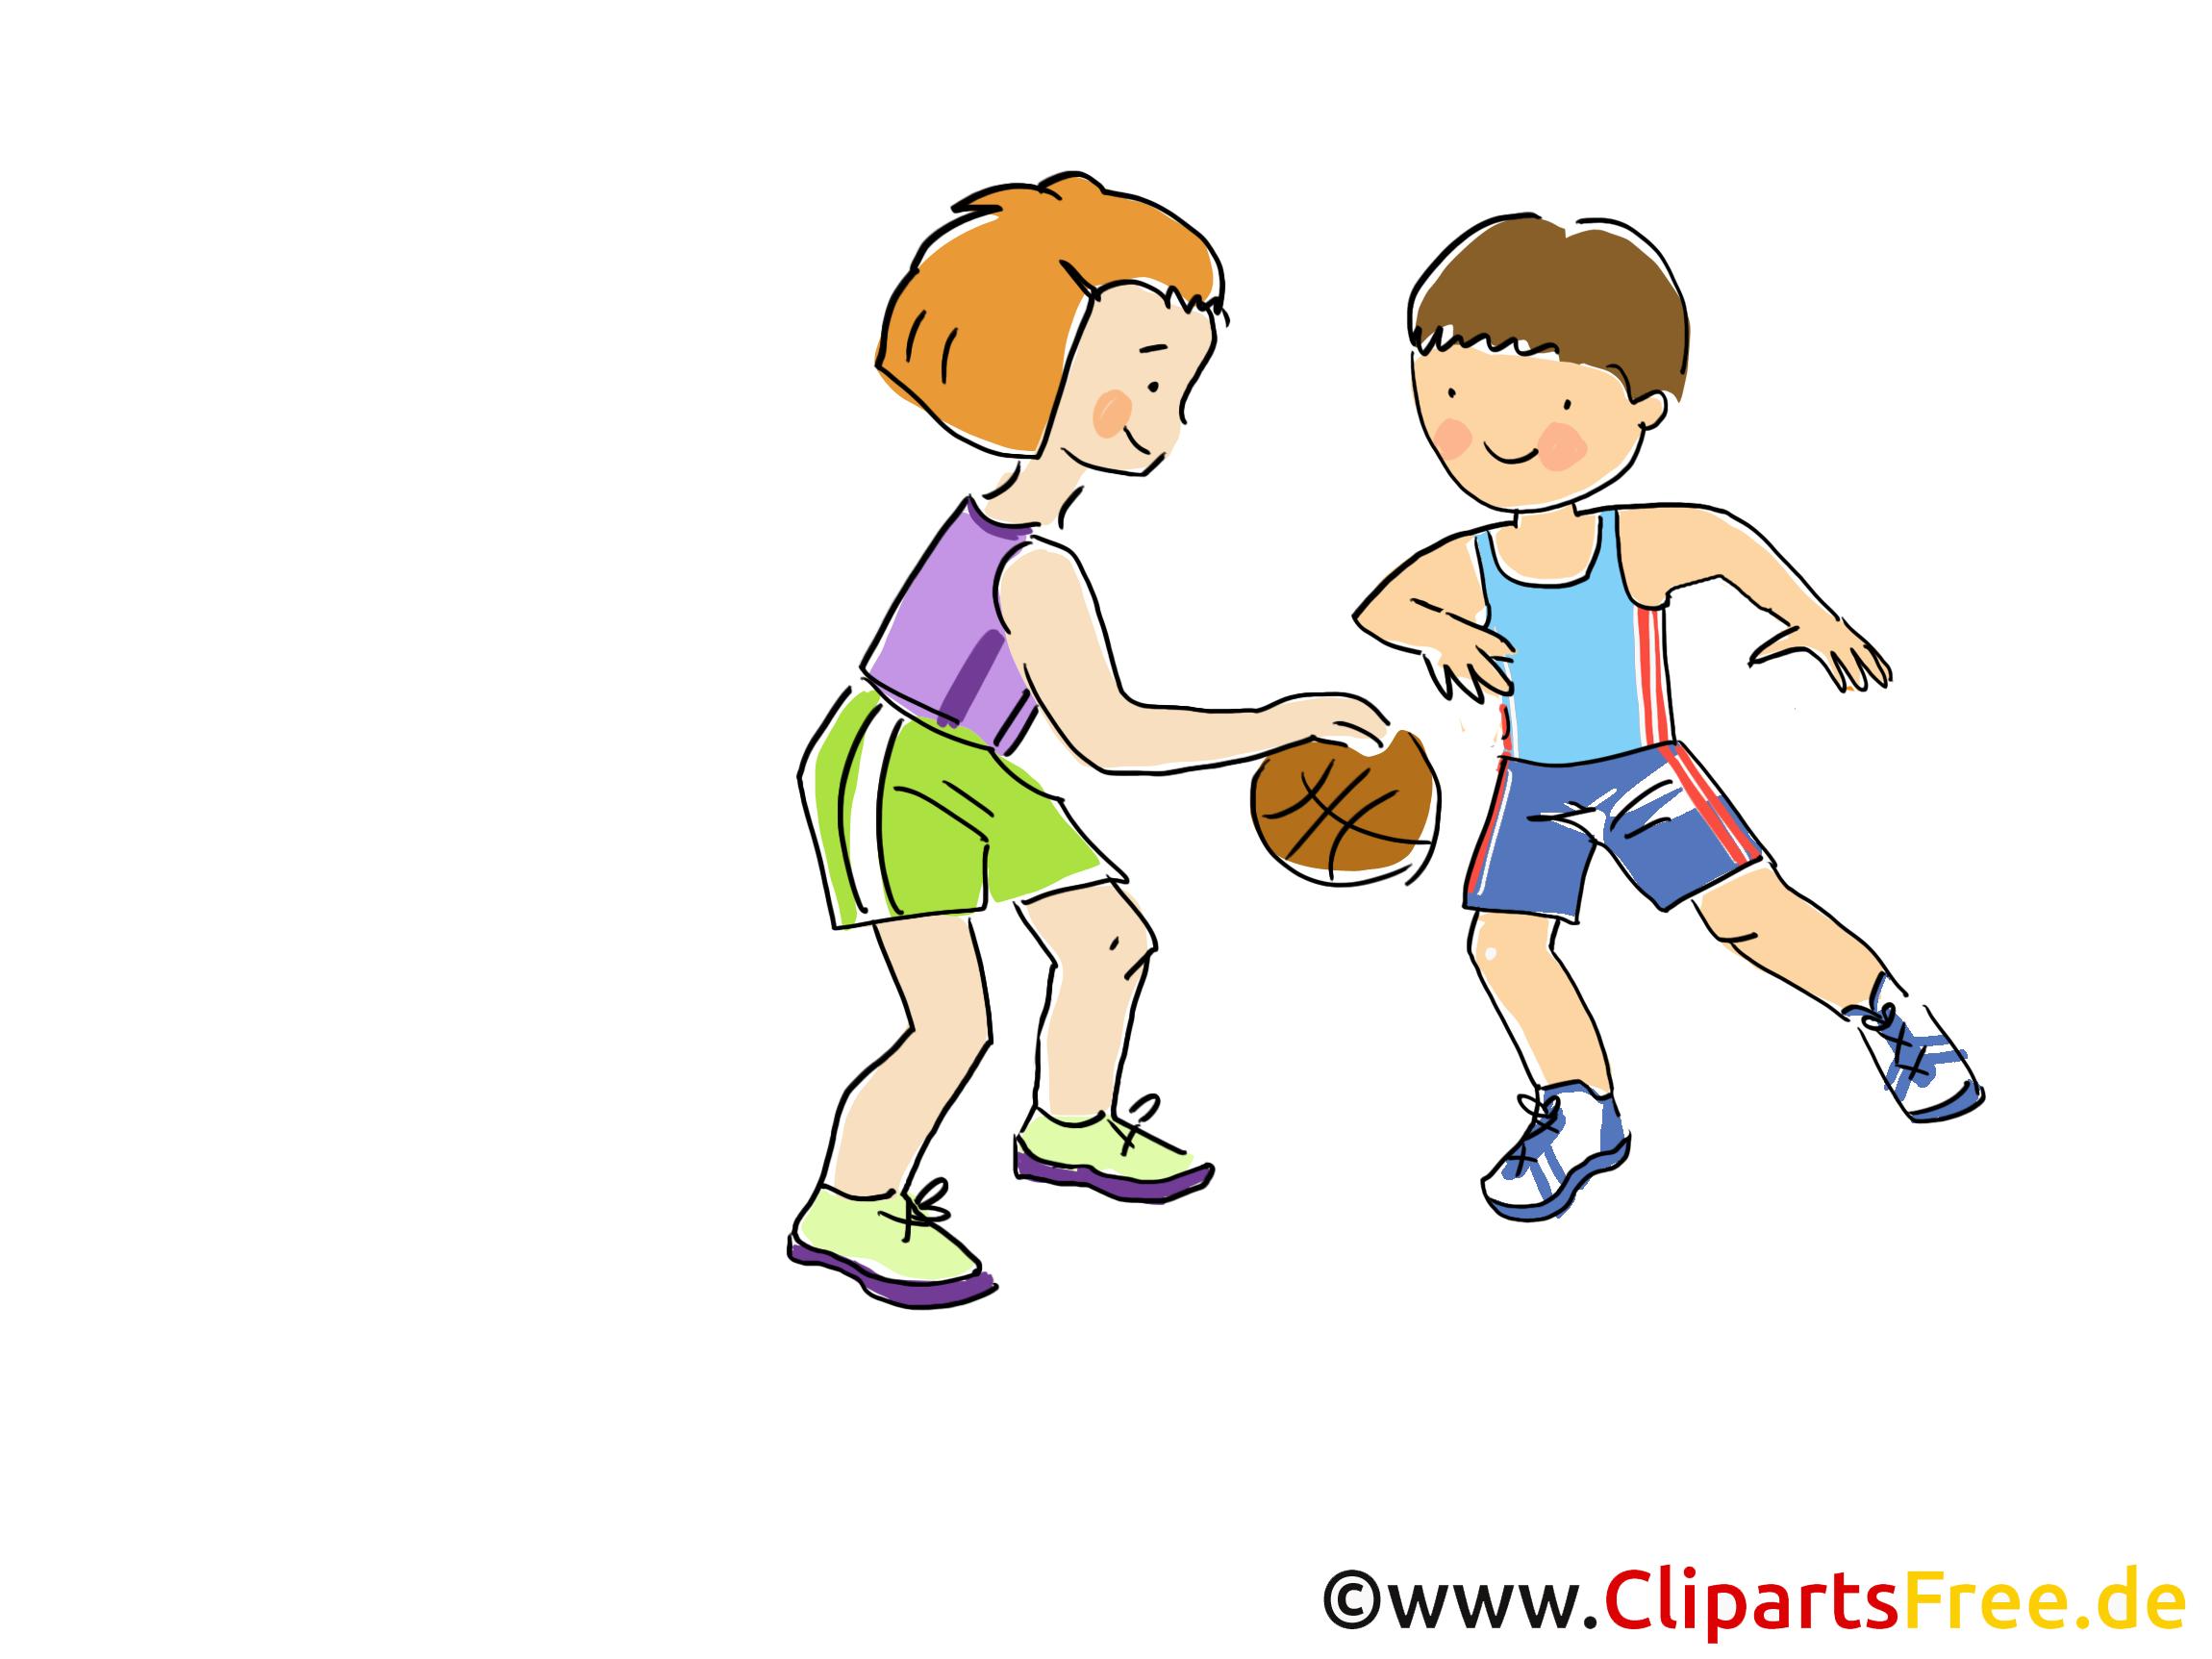 Basketbalafbeelding, Clipart, Comic, Cartoon, Afbeelding gratis